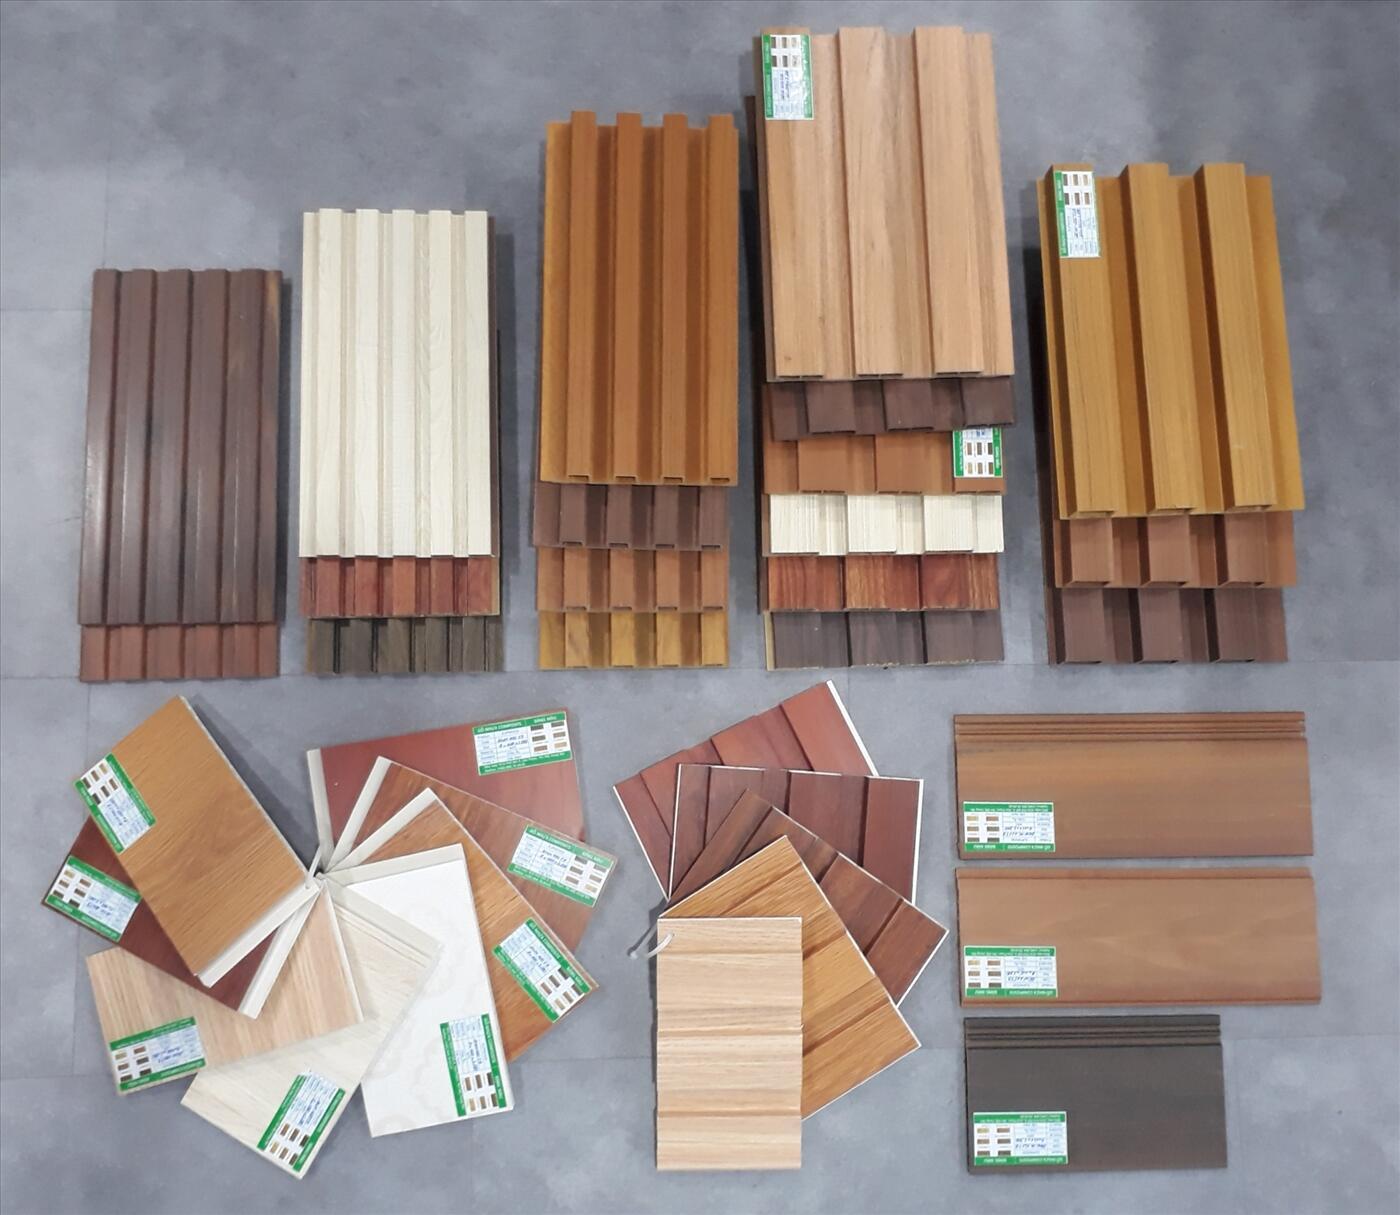 Một số mẫu Ốp gỗ nhựa Composite của Danacity